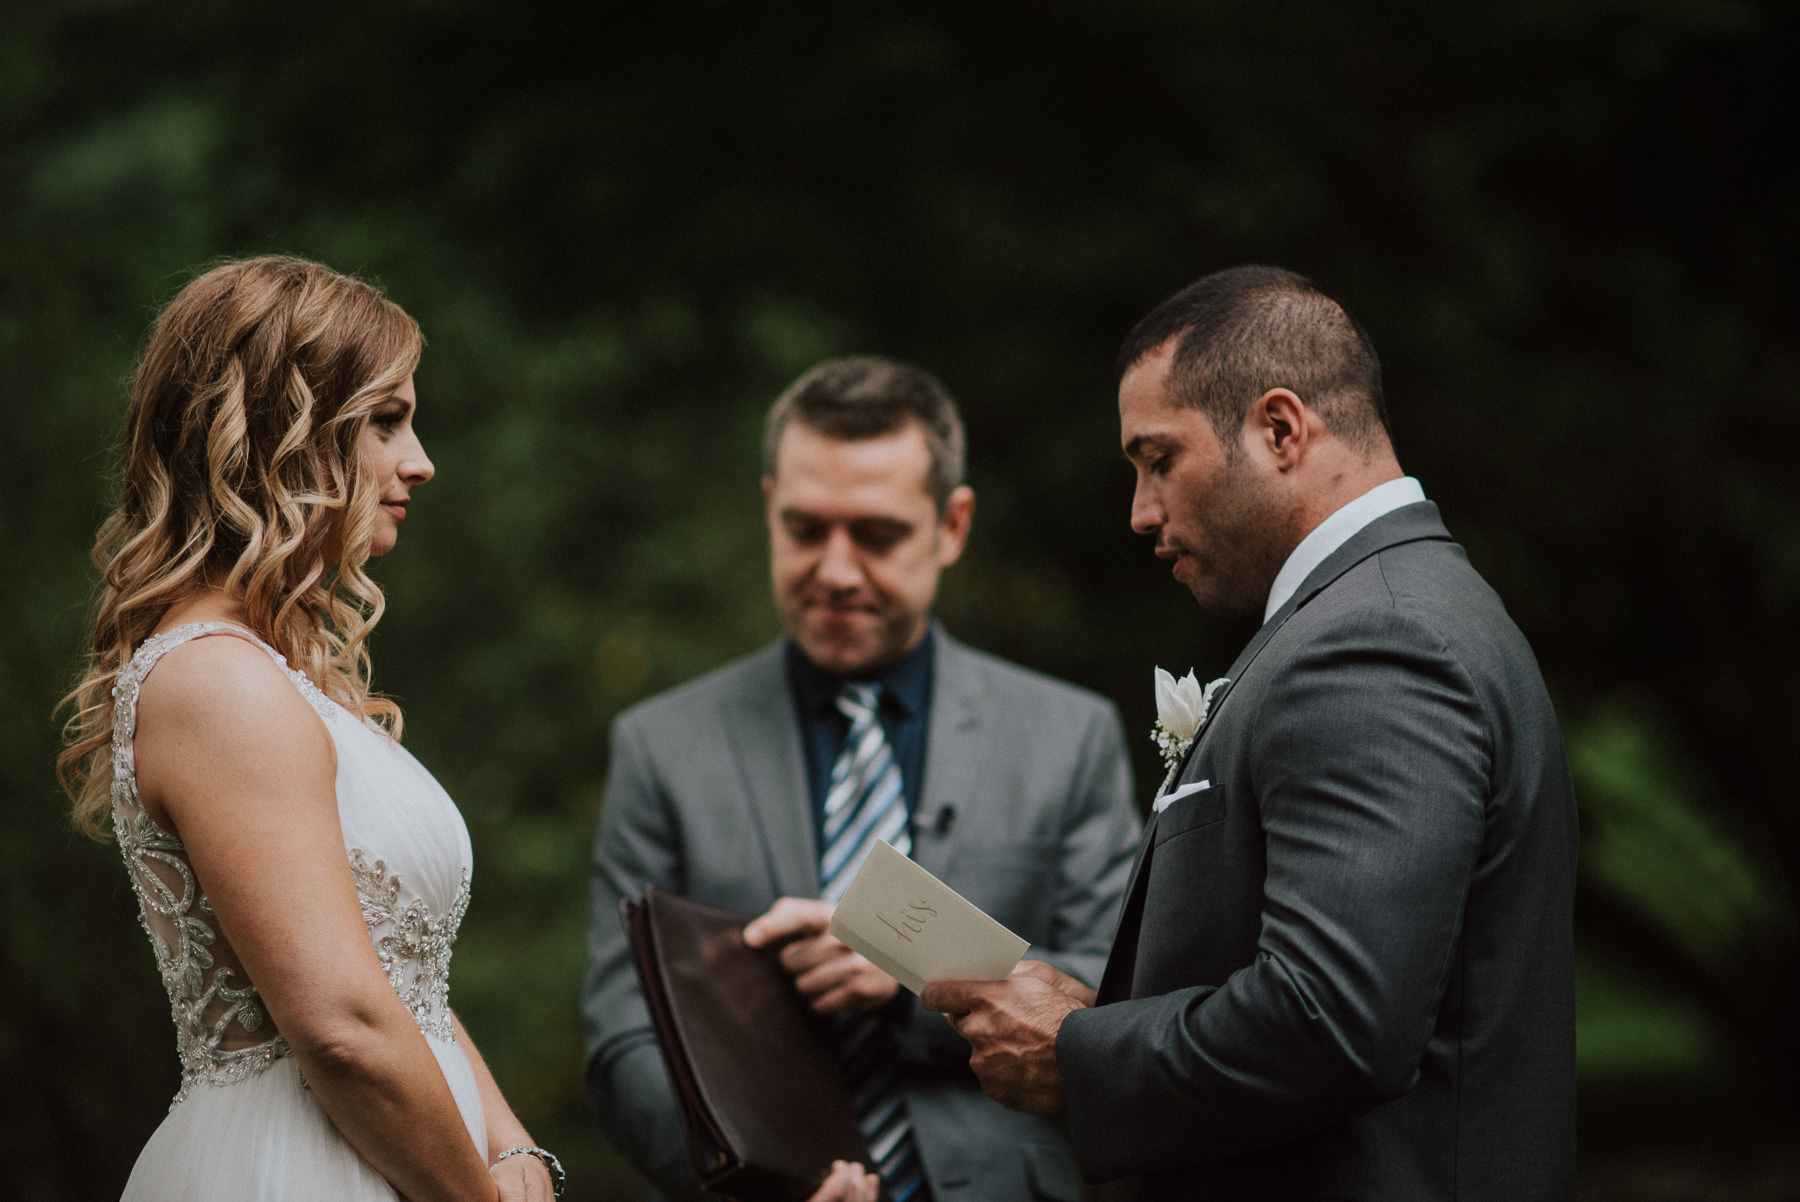 appleford-estate-wedding-photography-64.jpg